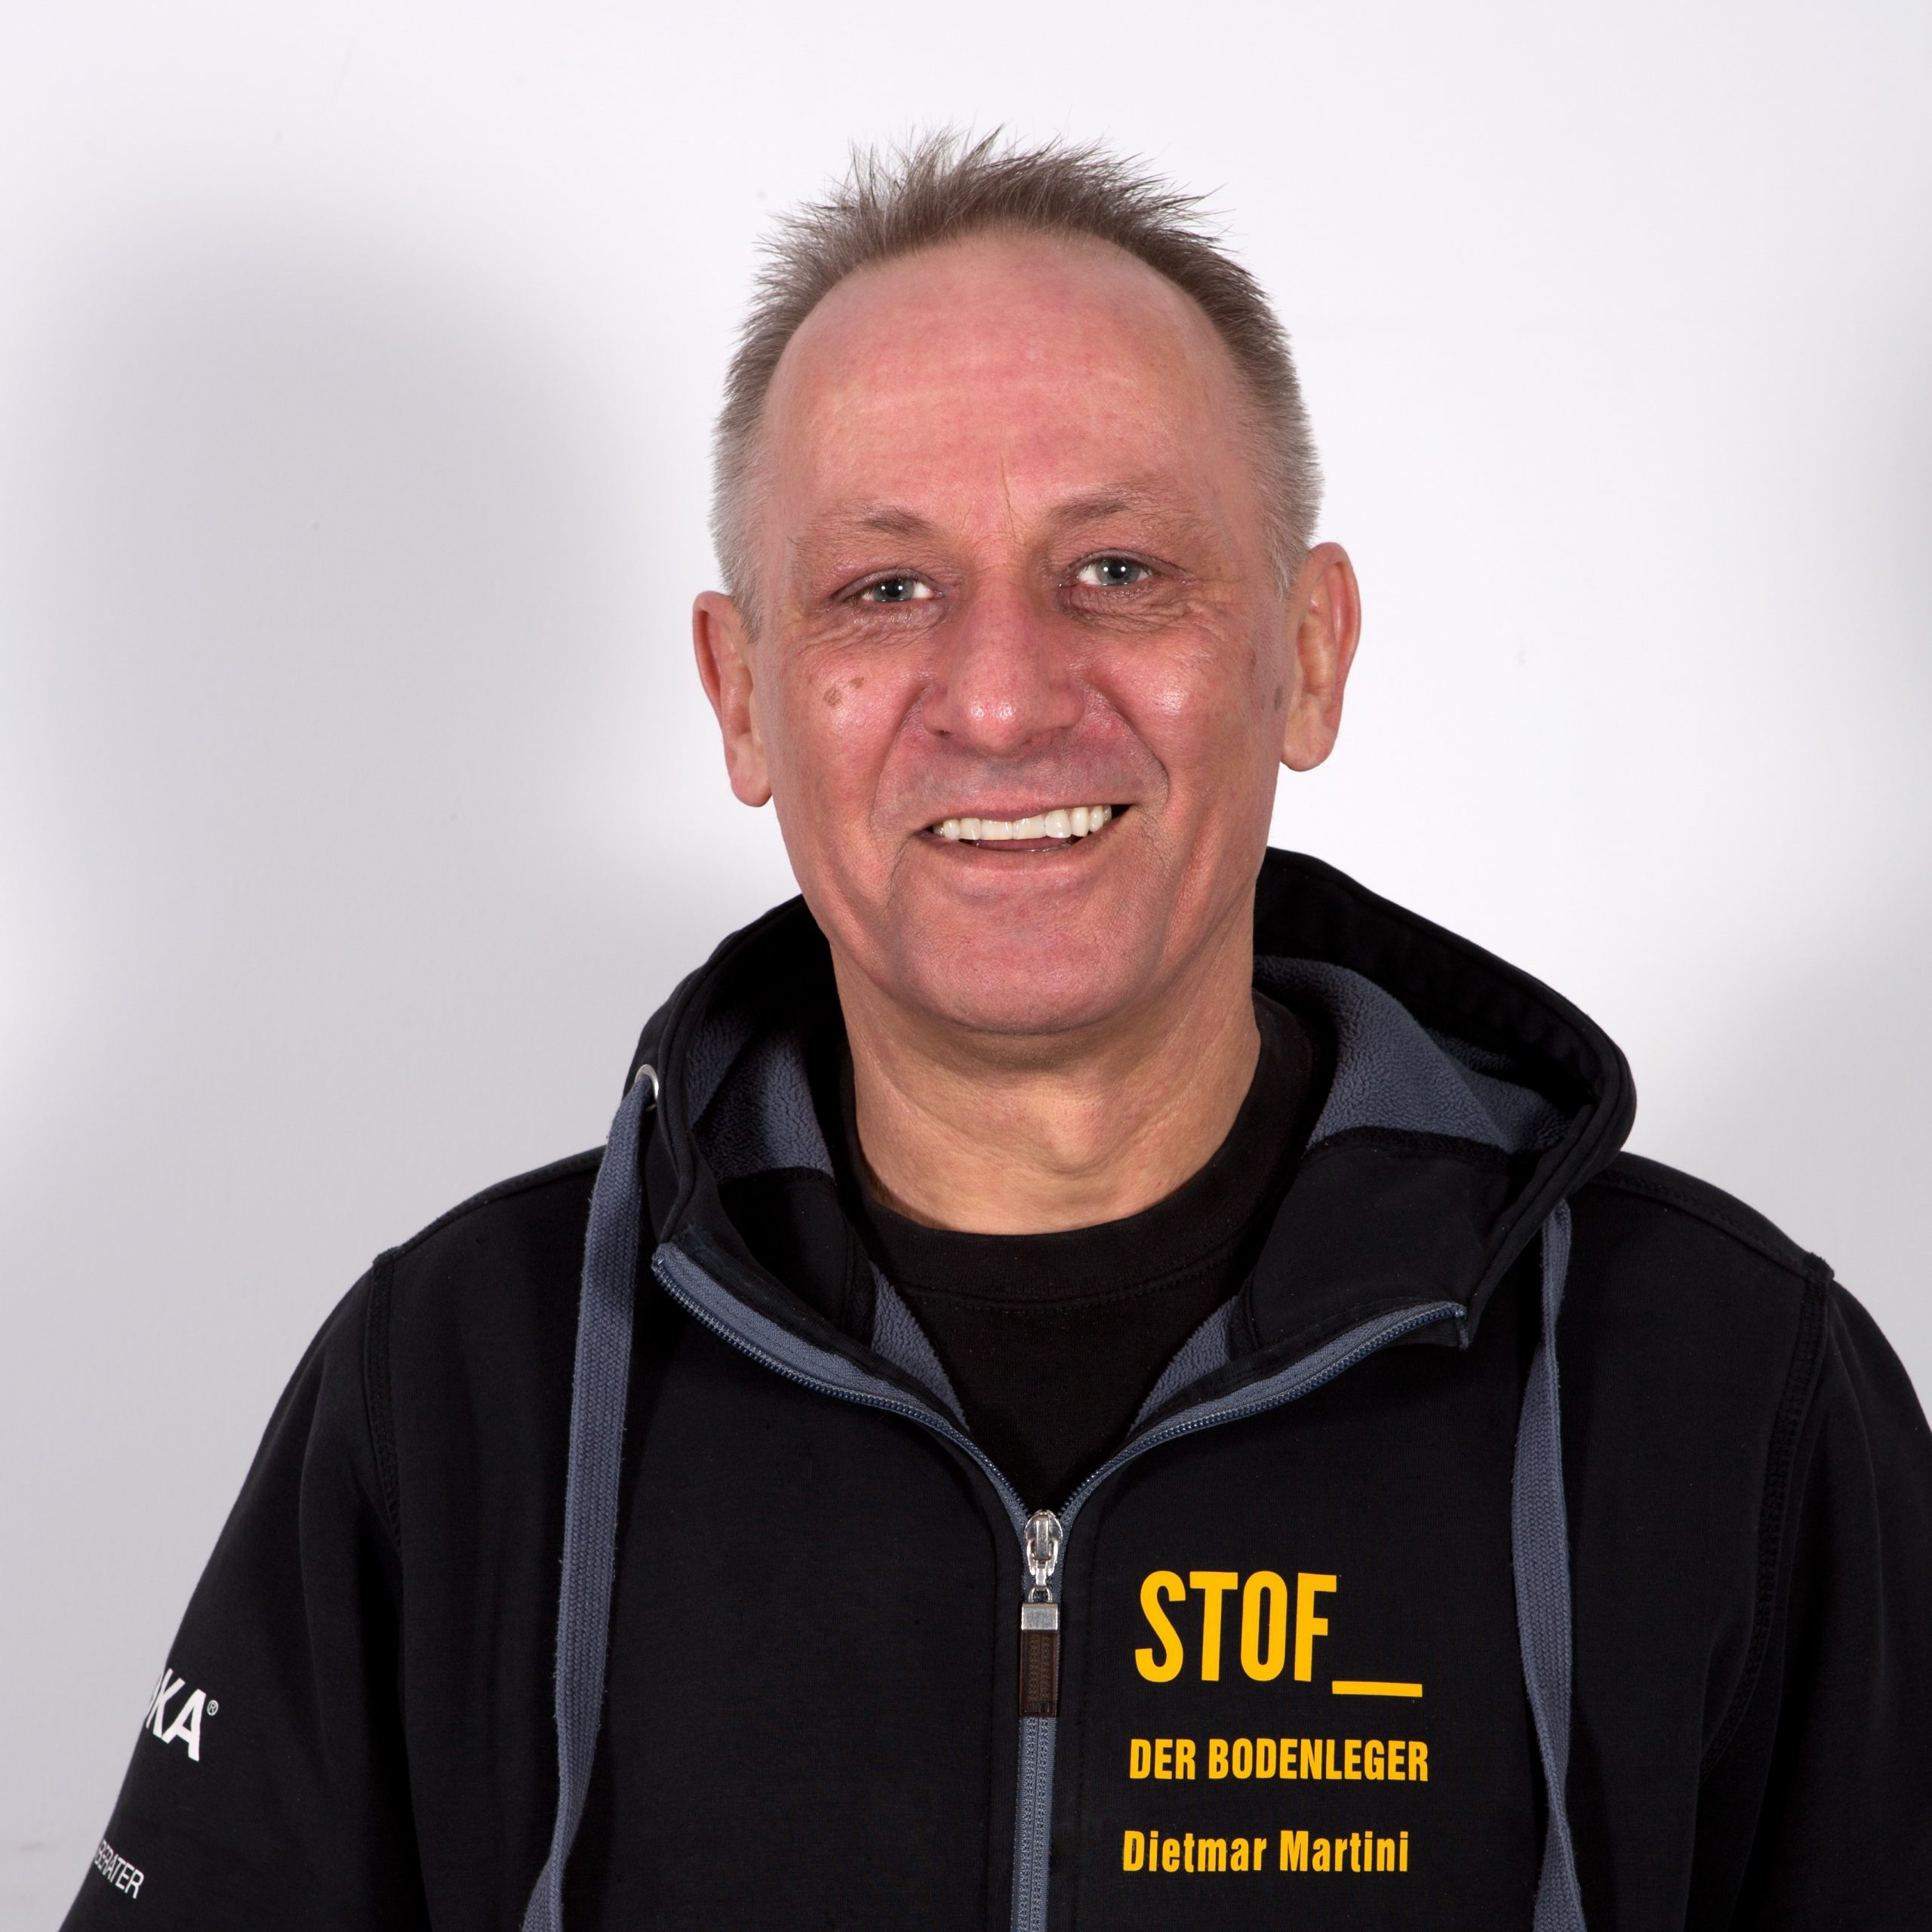 Dietmar Martini